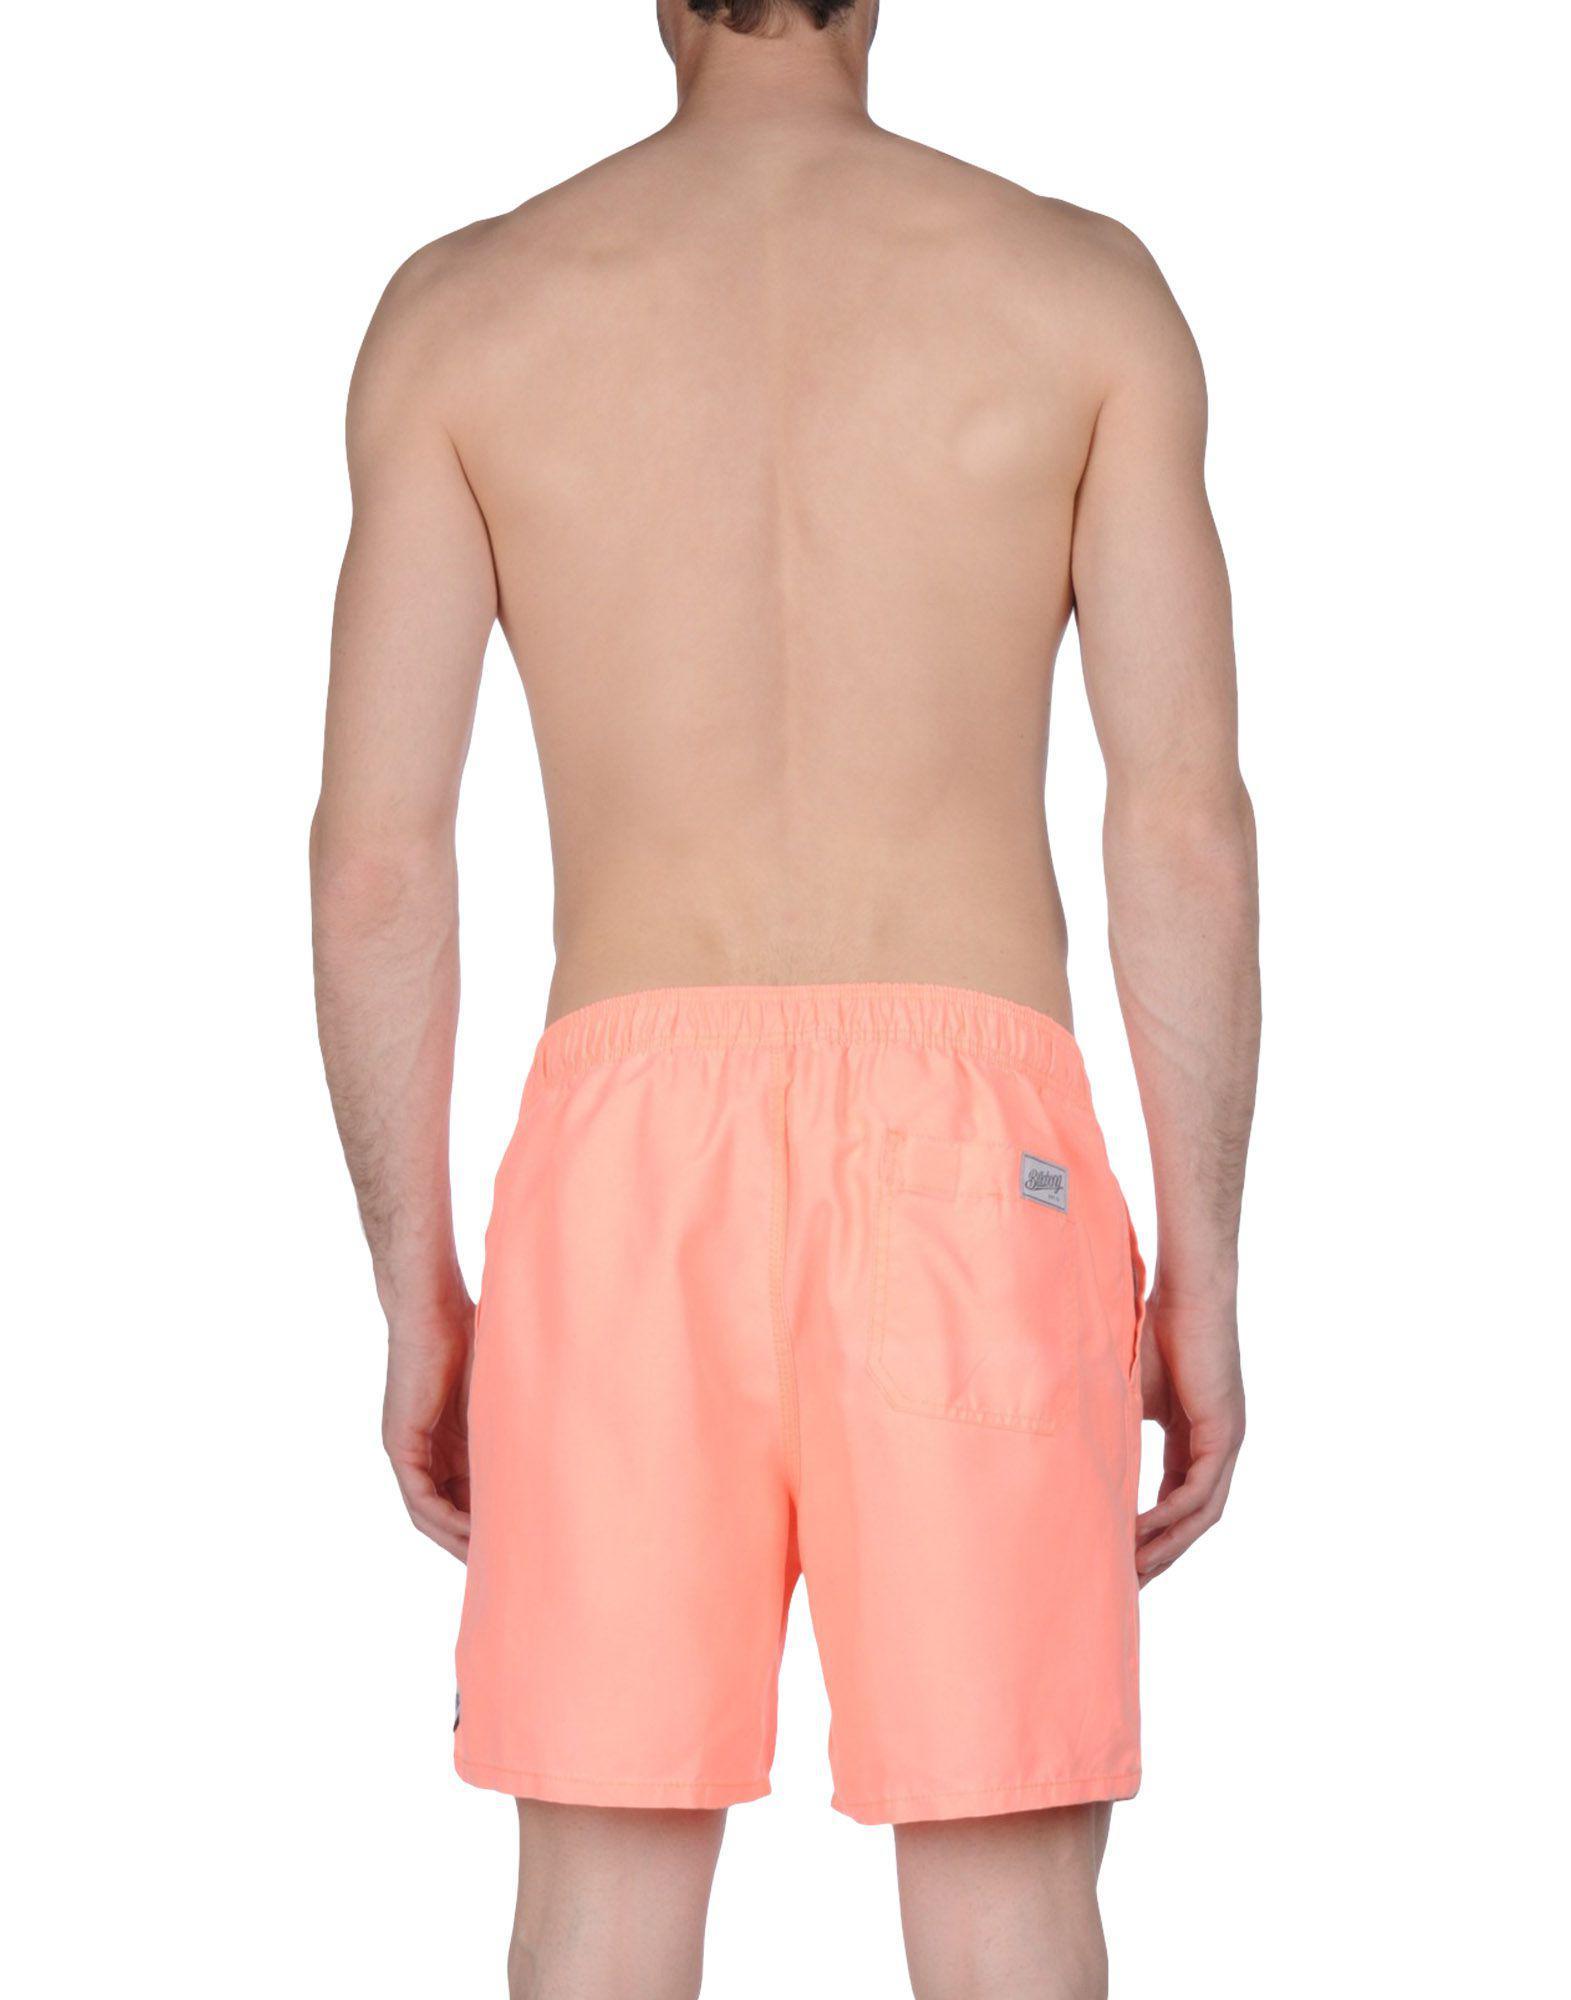 ef429c0fa5 Lyst - Billabong Swim Trunks in Orange for Men